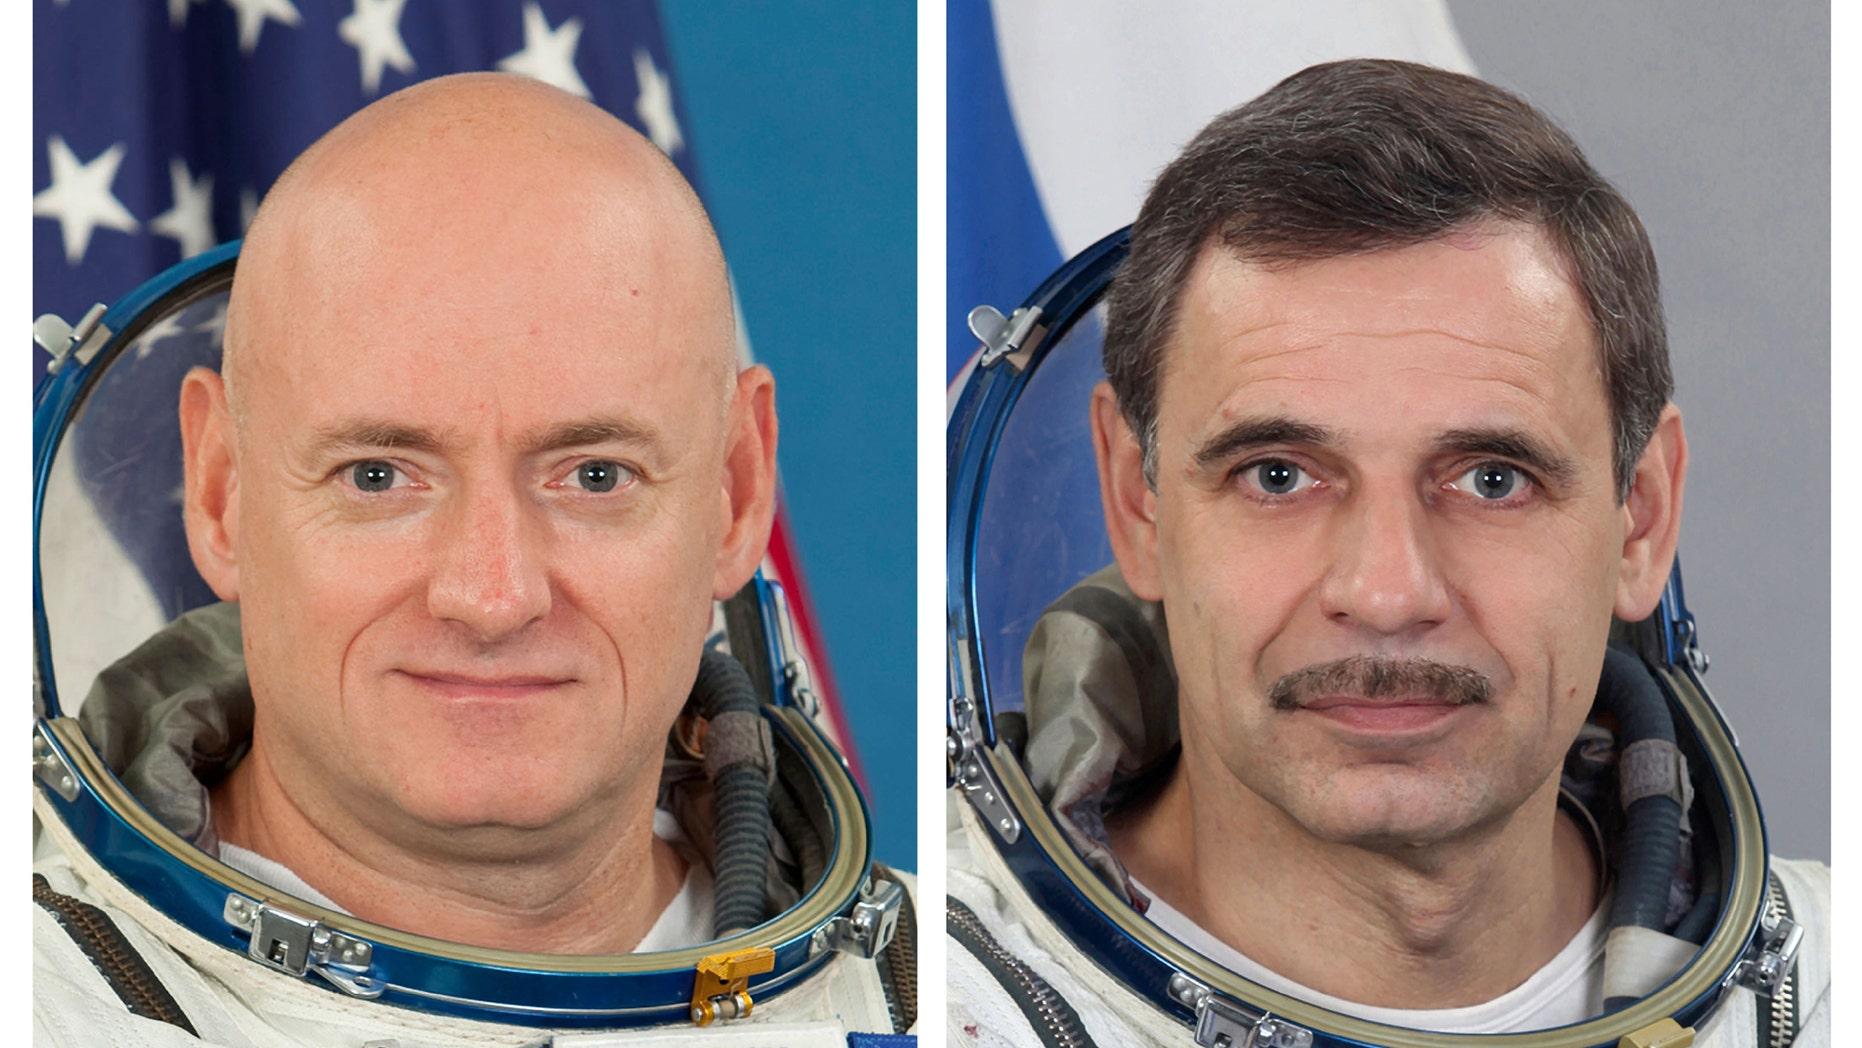 FILE - This combination of photos provided by the Gagarin Cosmonaut Training Center via NASA, shows NASA astronaut Scott Kelly, left, and Russian cosmonaut Mikhail Kornienko.